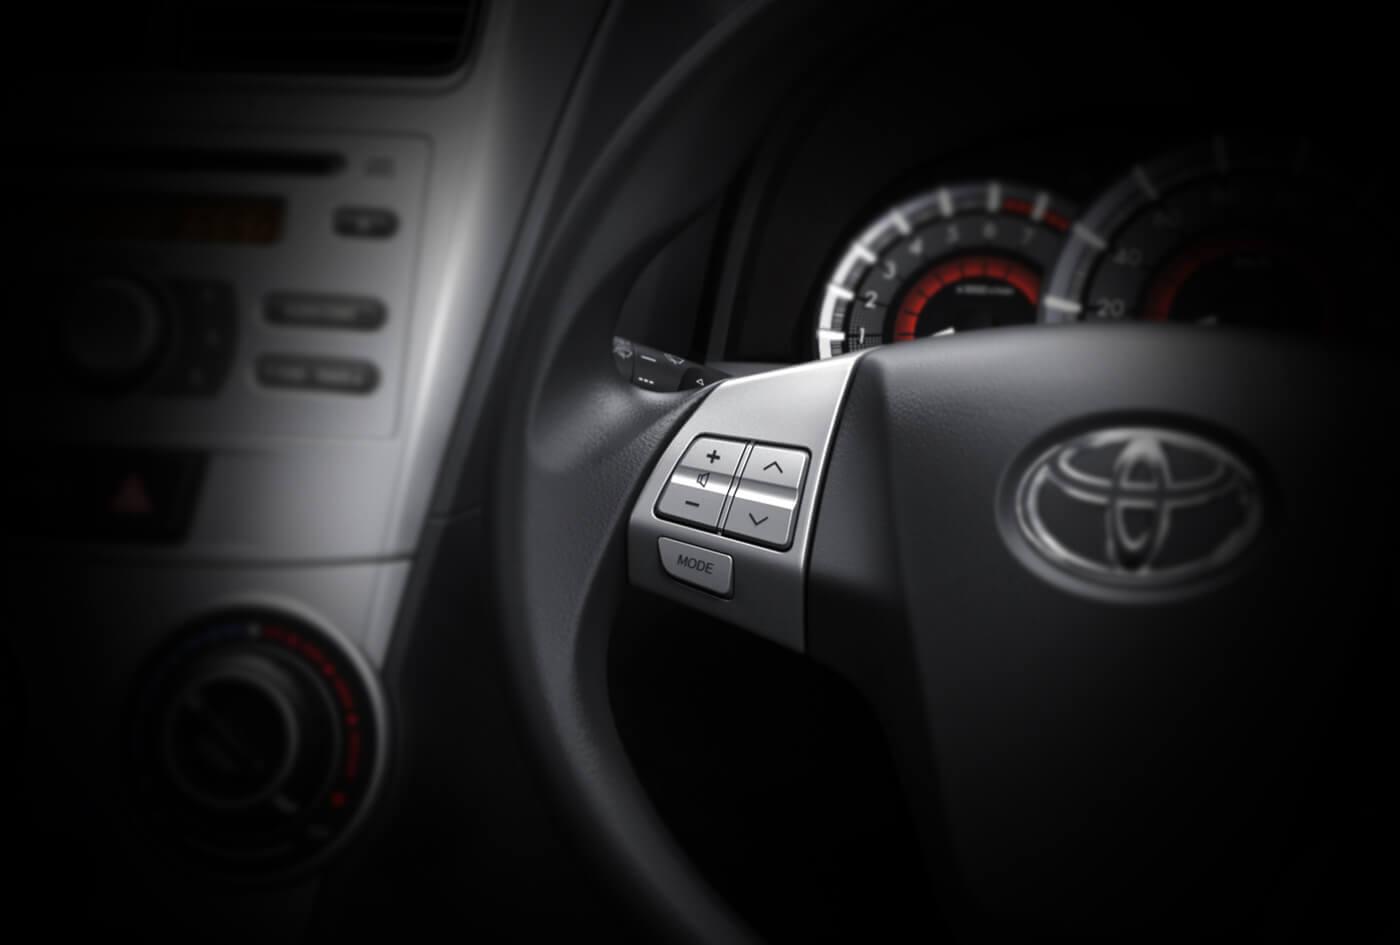 grand new avanza nebula blue kijang innova luxury captain seat steering switches